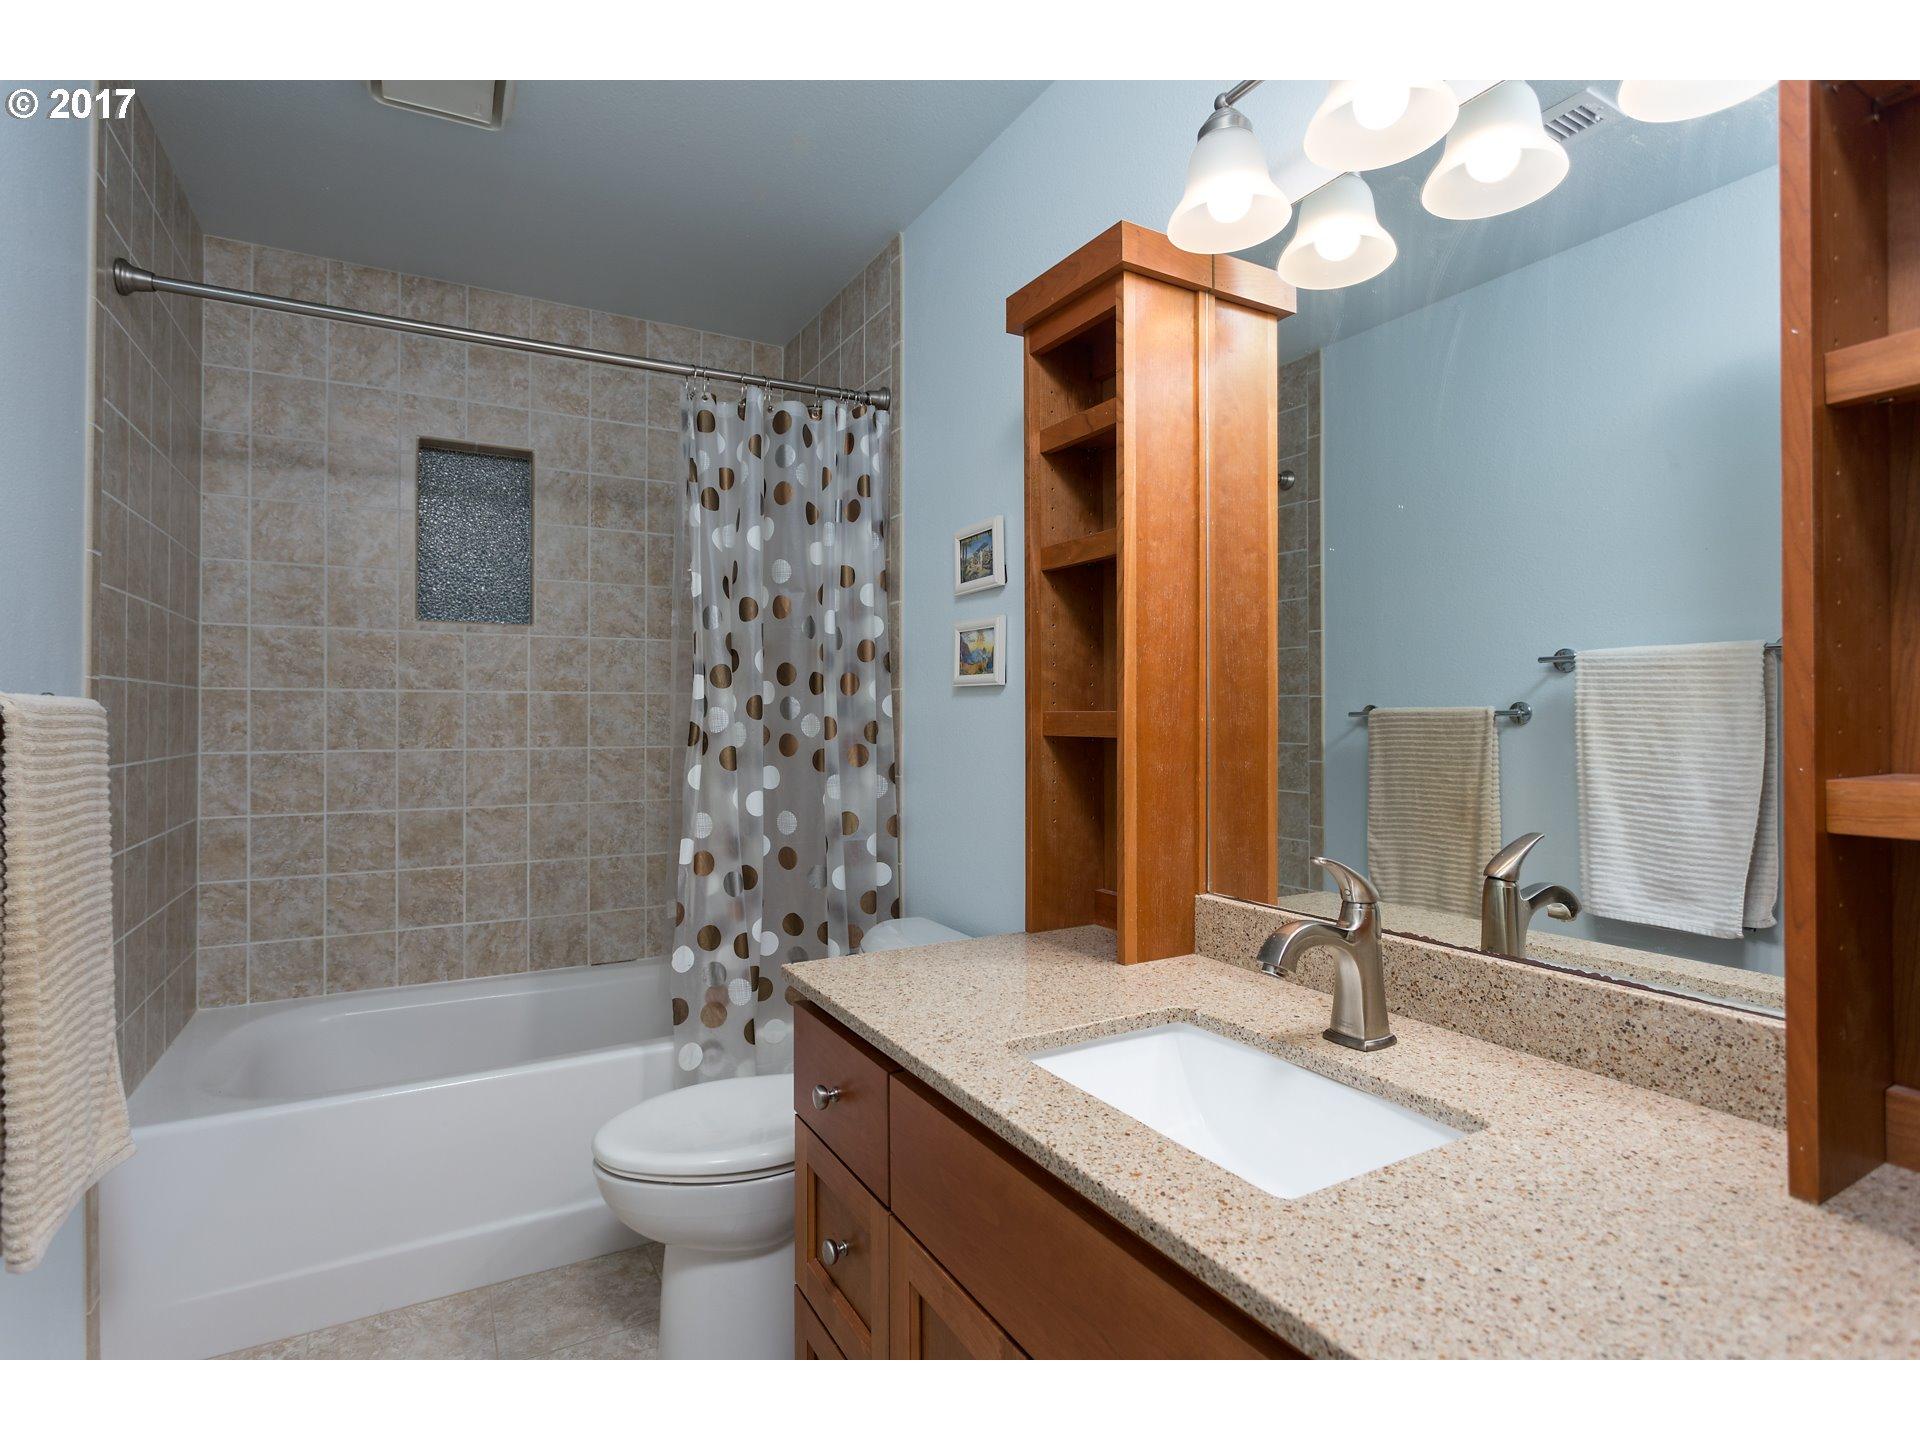 6081 CLAIRMONT CT Lake Oswego, OR 97035 - MLS #: 17636868